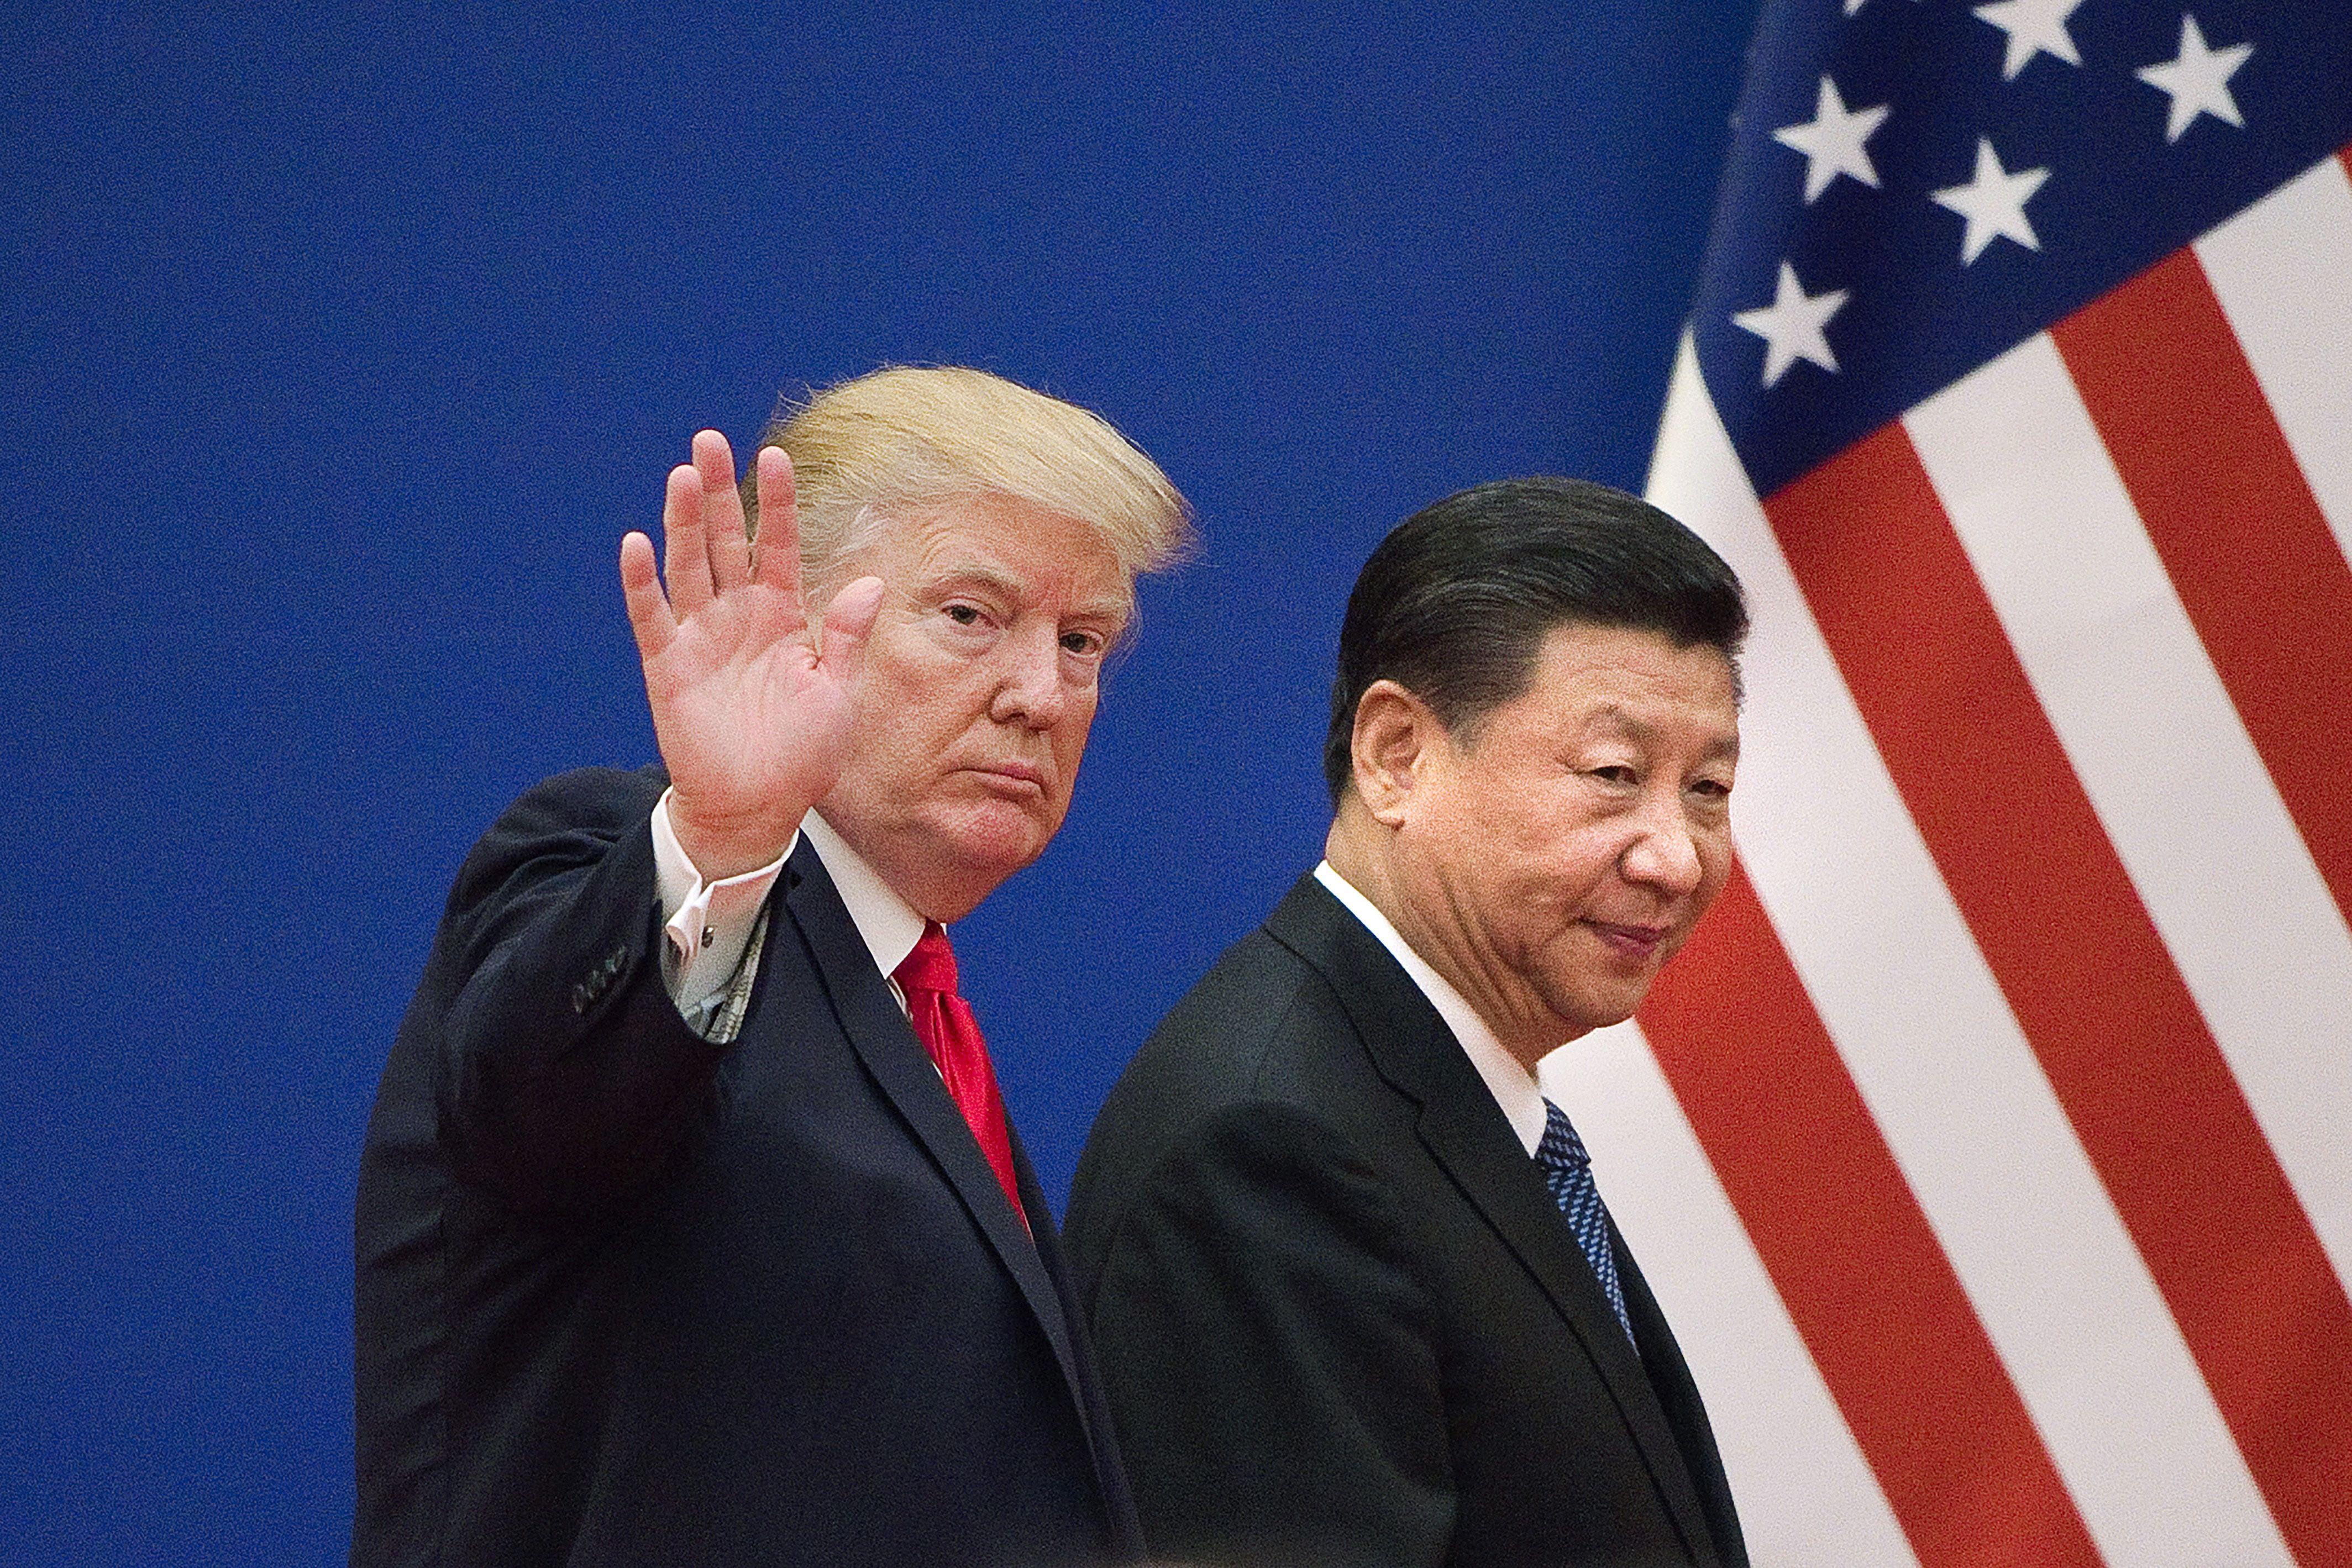 G20習特會敲定,但達成甚麼協定外界關注。(NICOLAS ASFOURI/AFP/Getty Images)